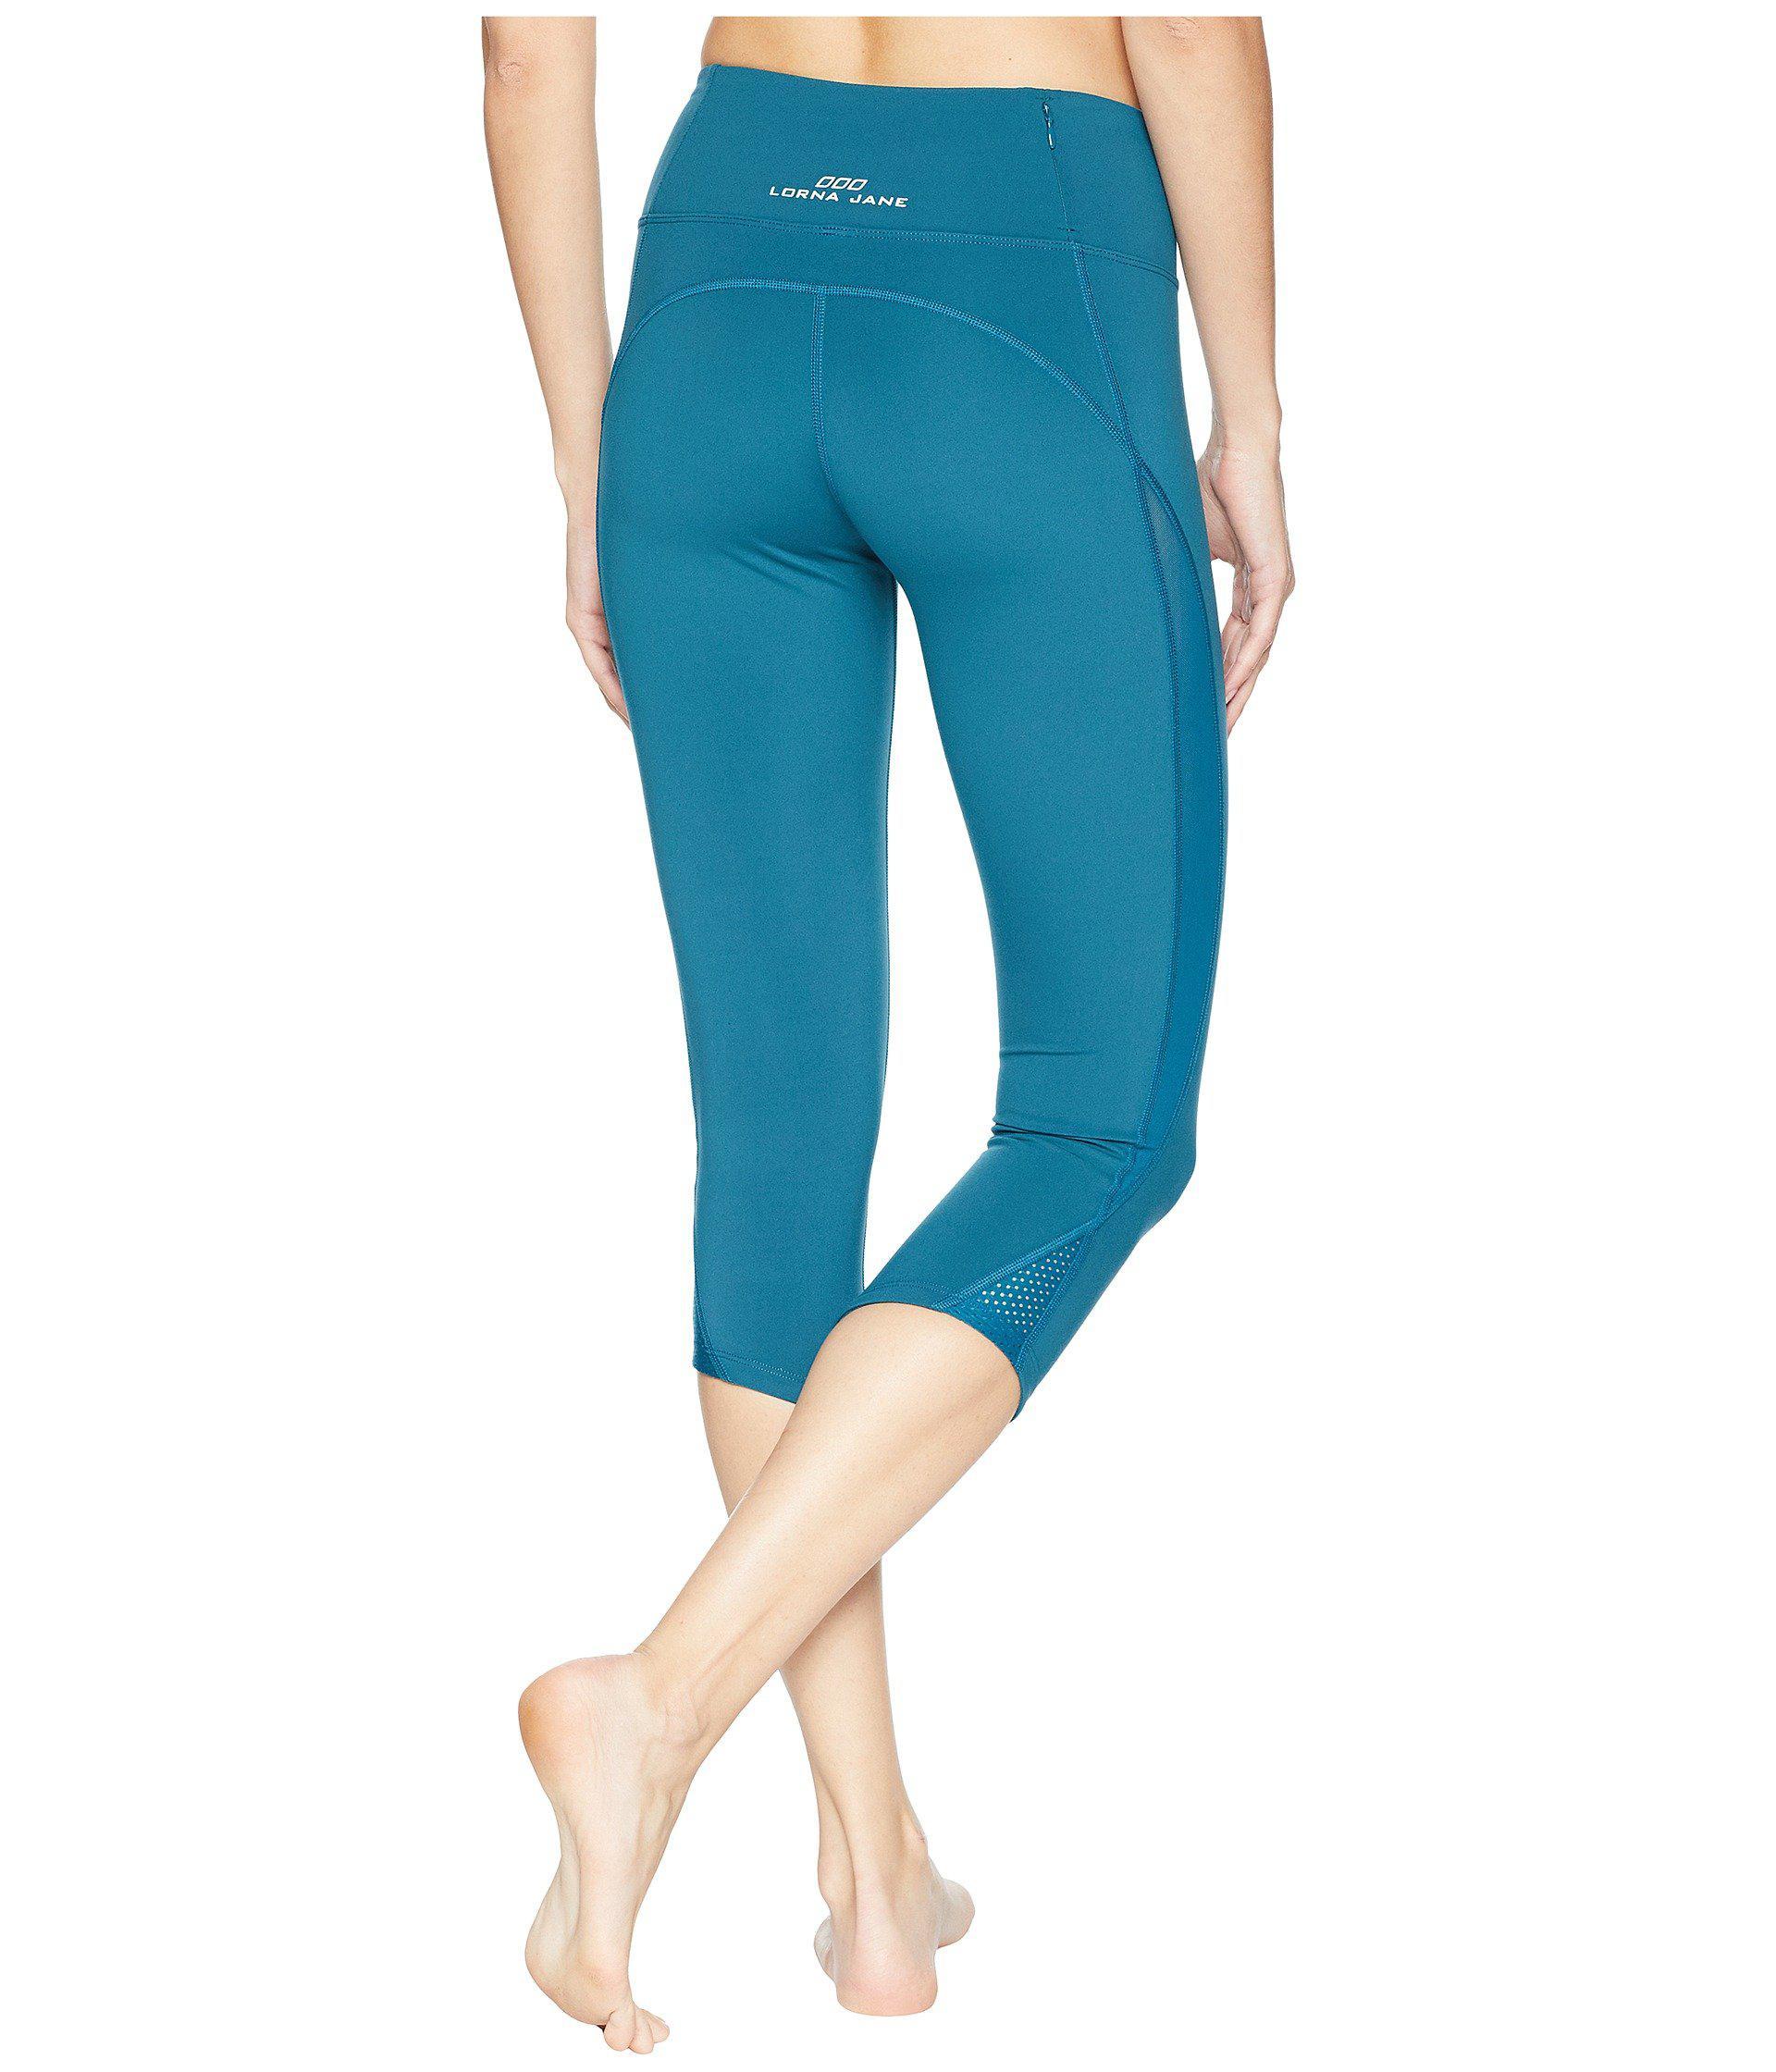 e3348c3f6149c Lyst - Lorna Jane Infinity Core 7 8 Tights in Blue